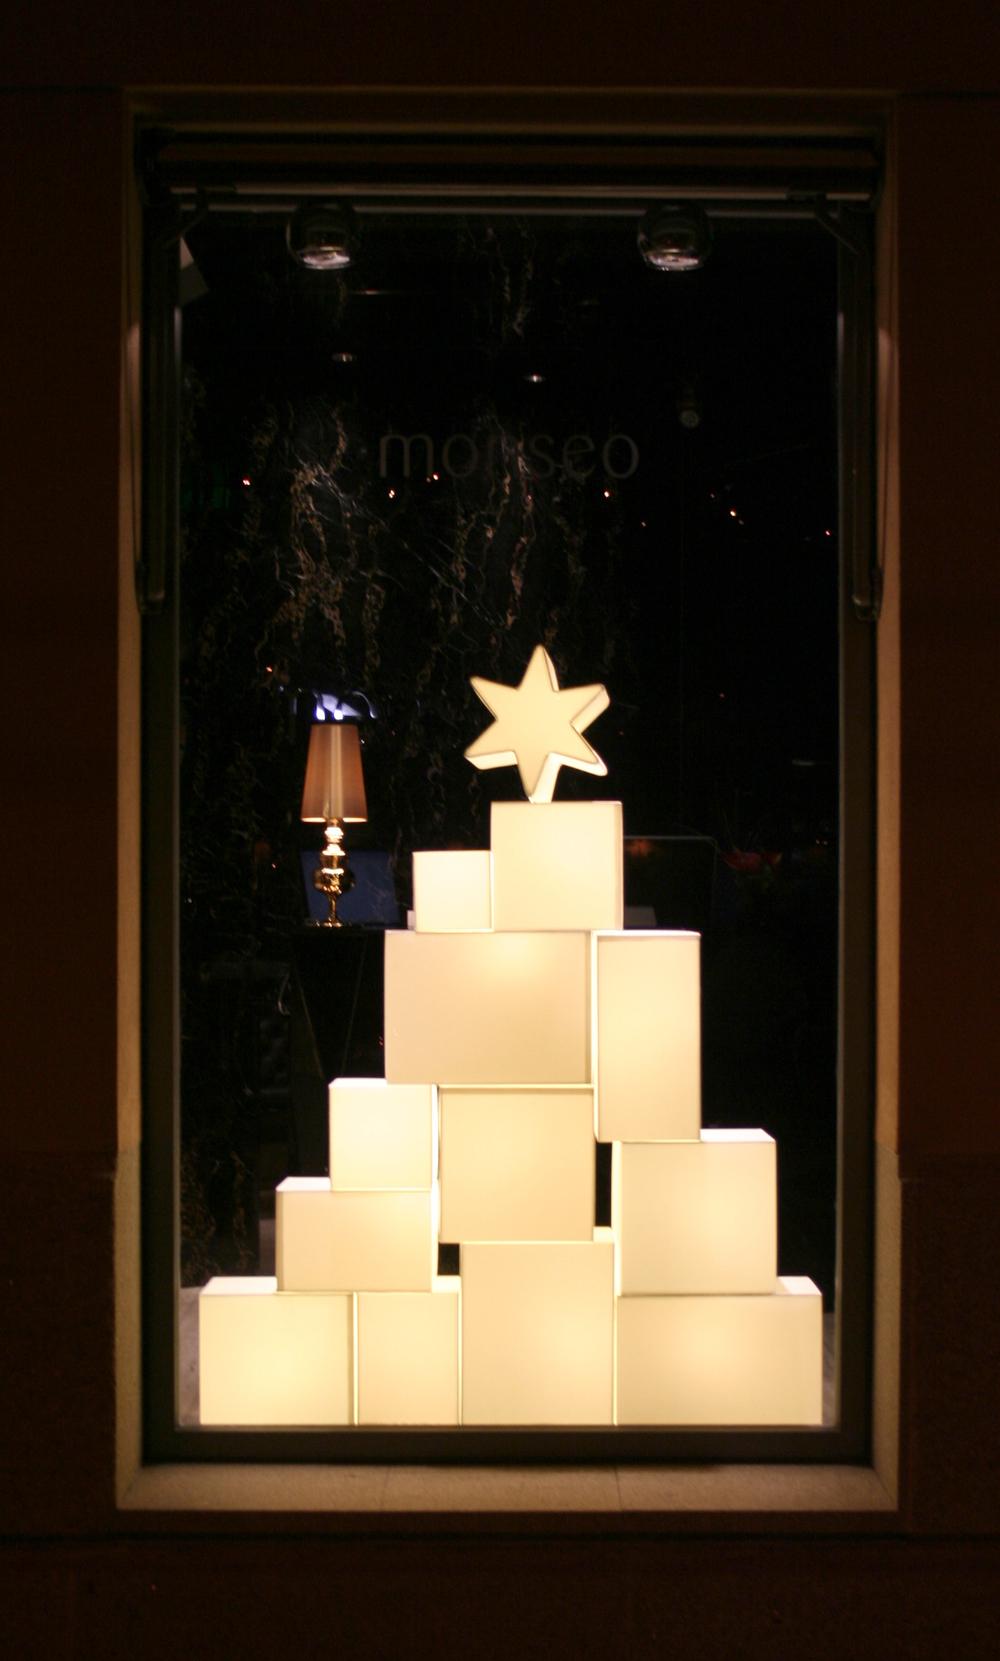 Christmas tree Windows displays Monseo, 2009